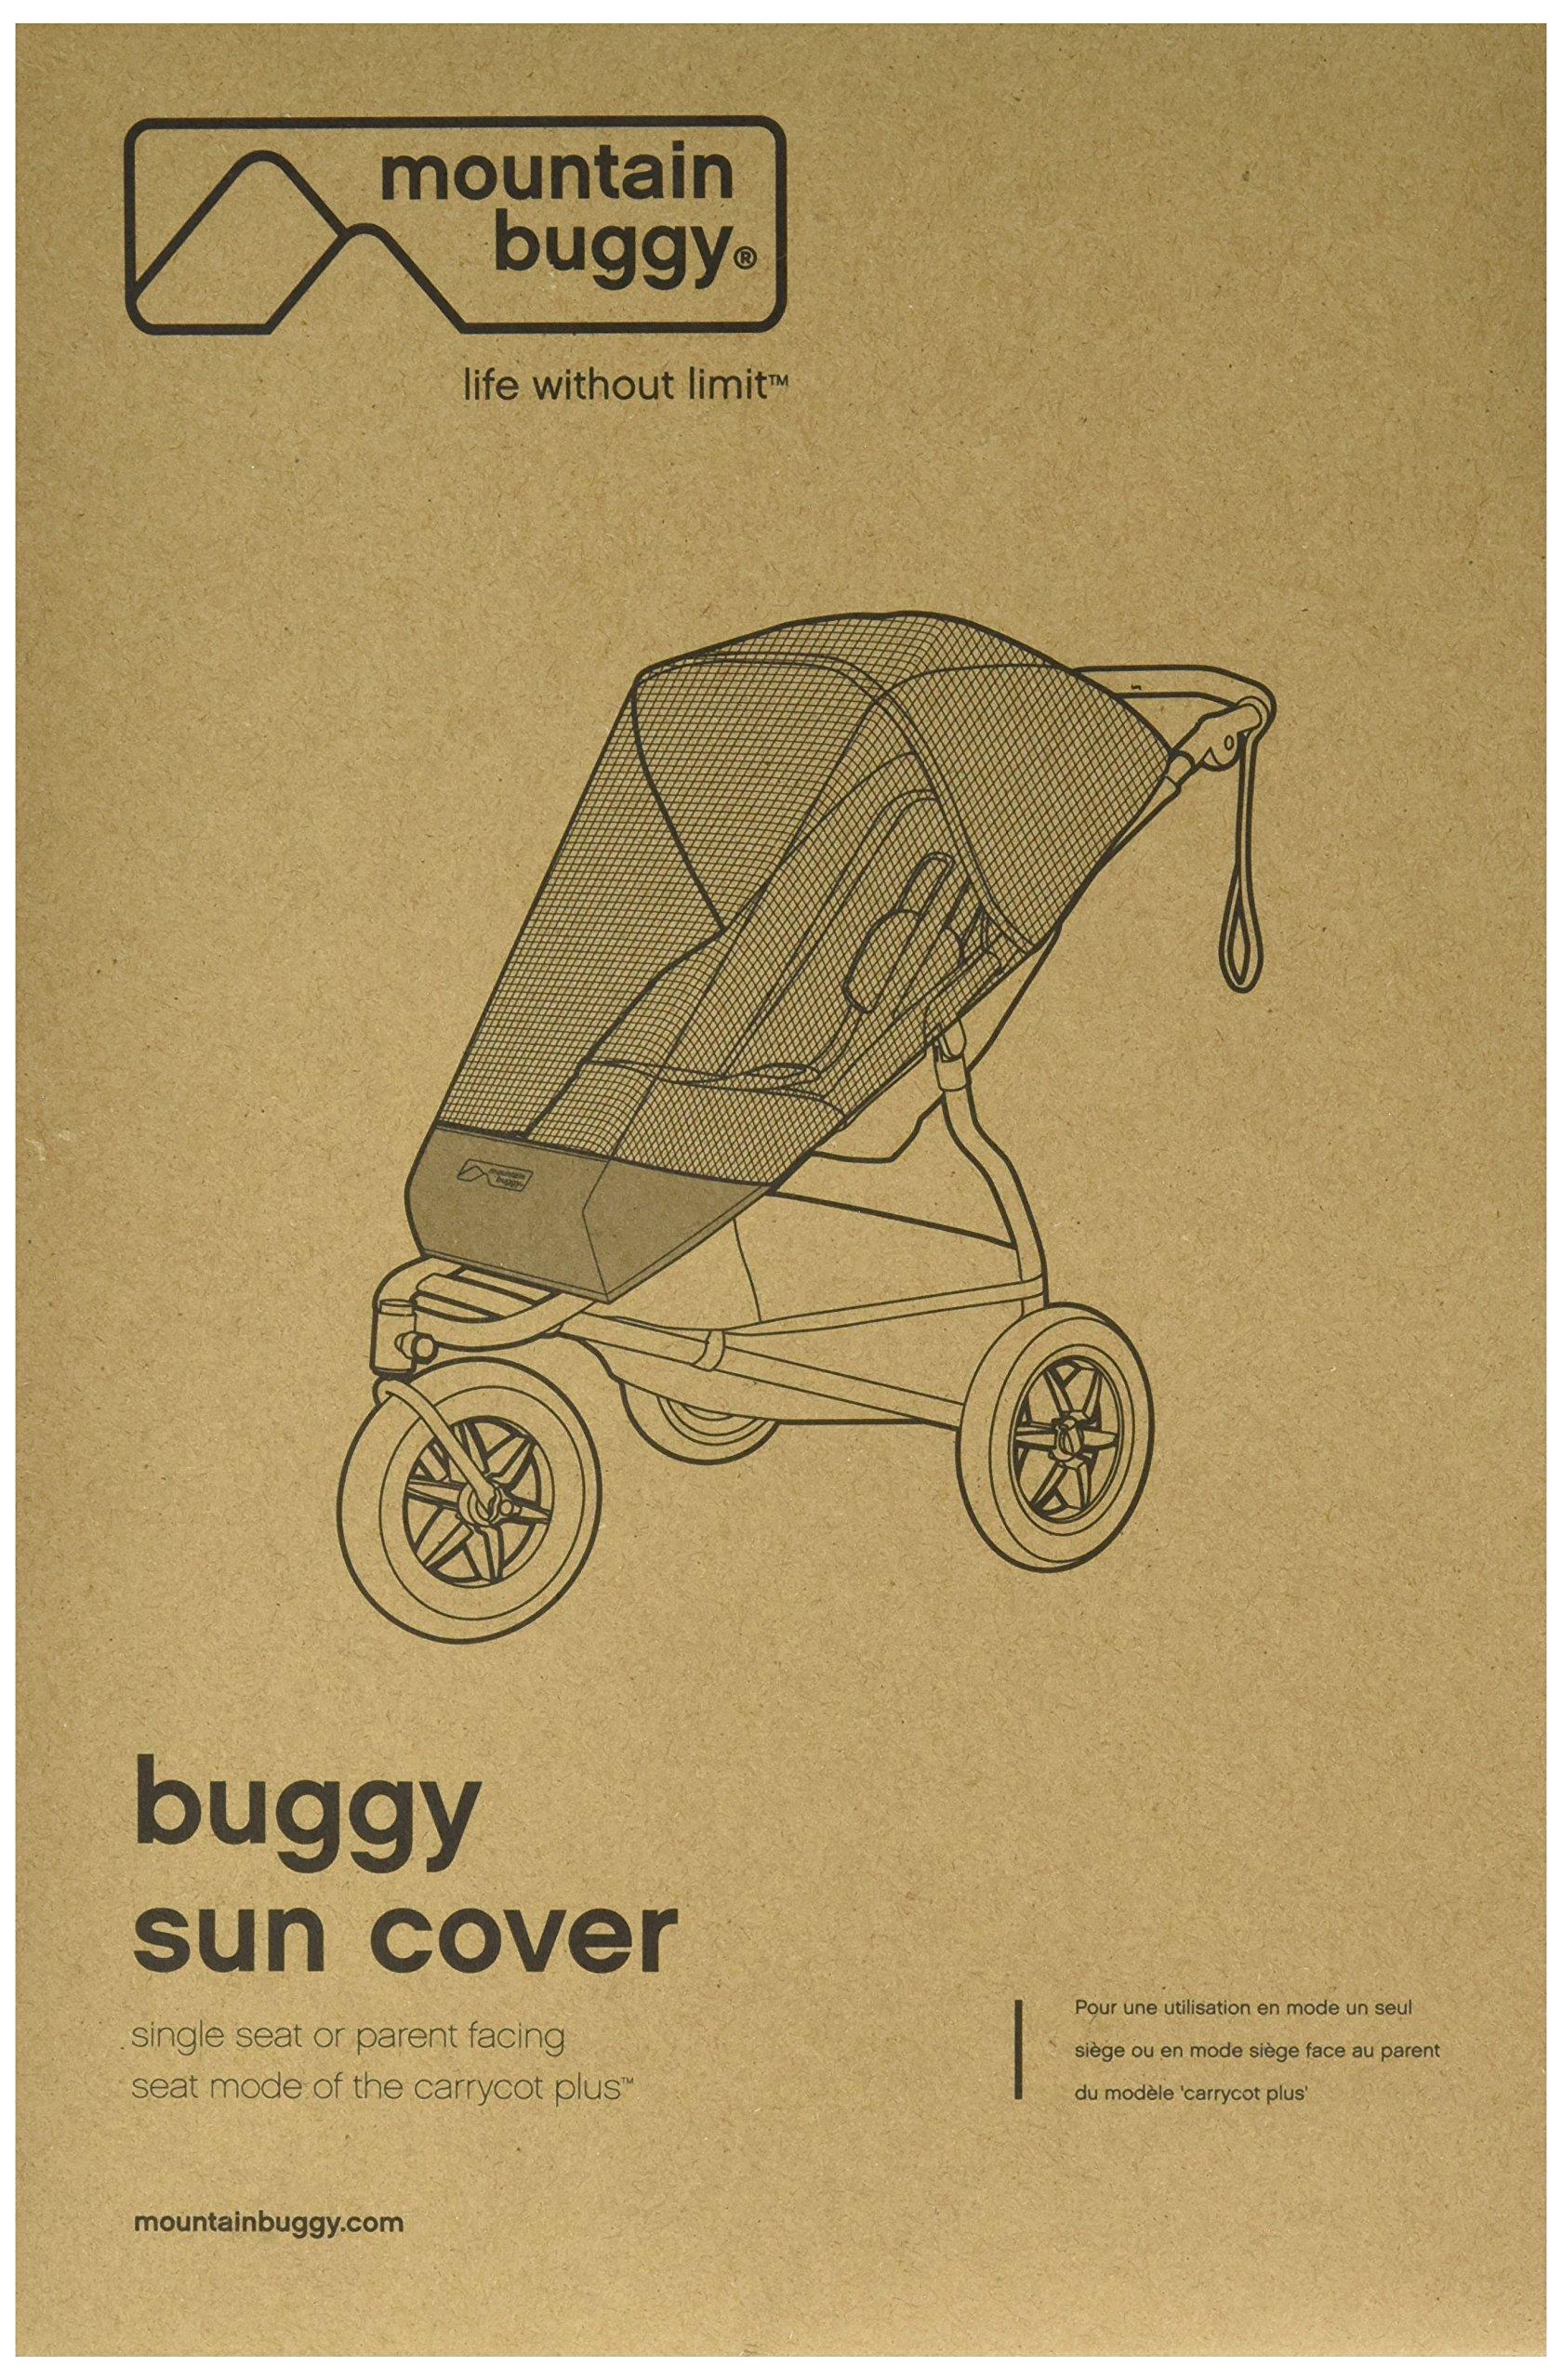 Mountain Buggy Sun Cover for 2015 Terrain and Urban Jungle Stroller